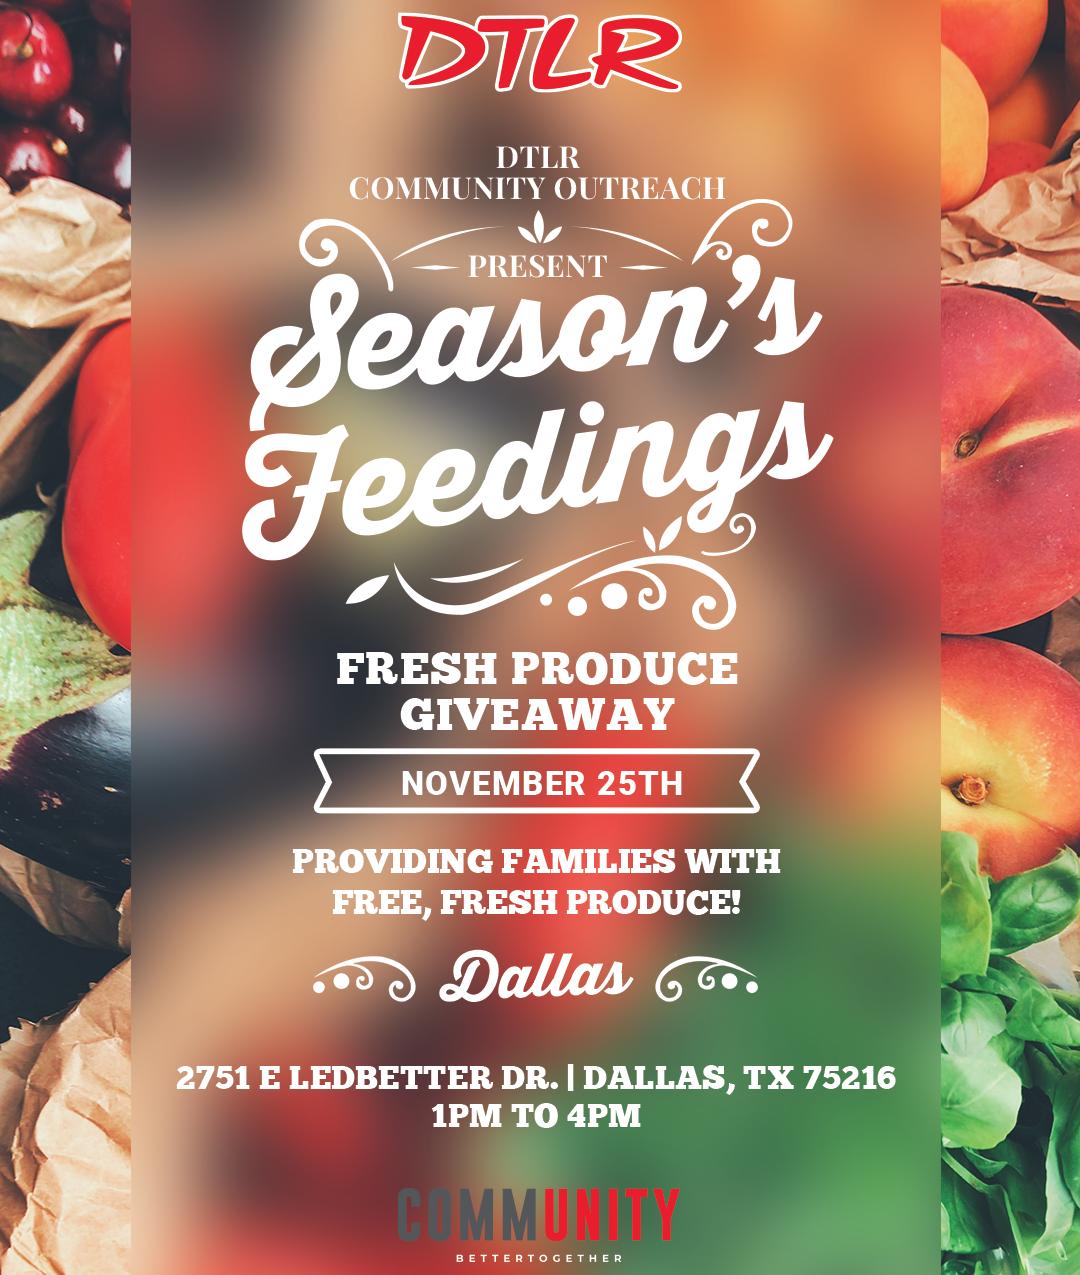 Food Drive Flyer - IG Post - Dallas